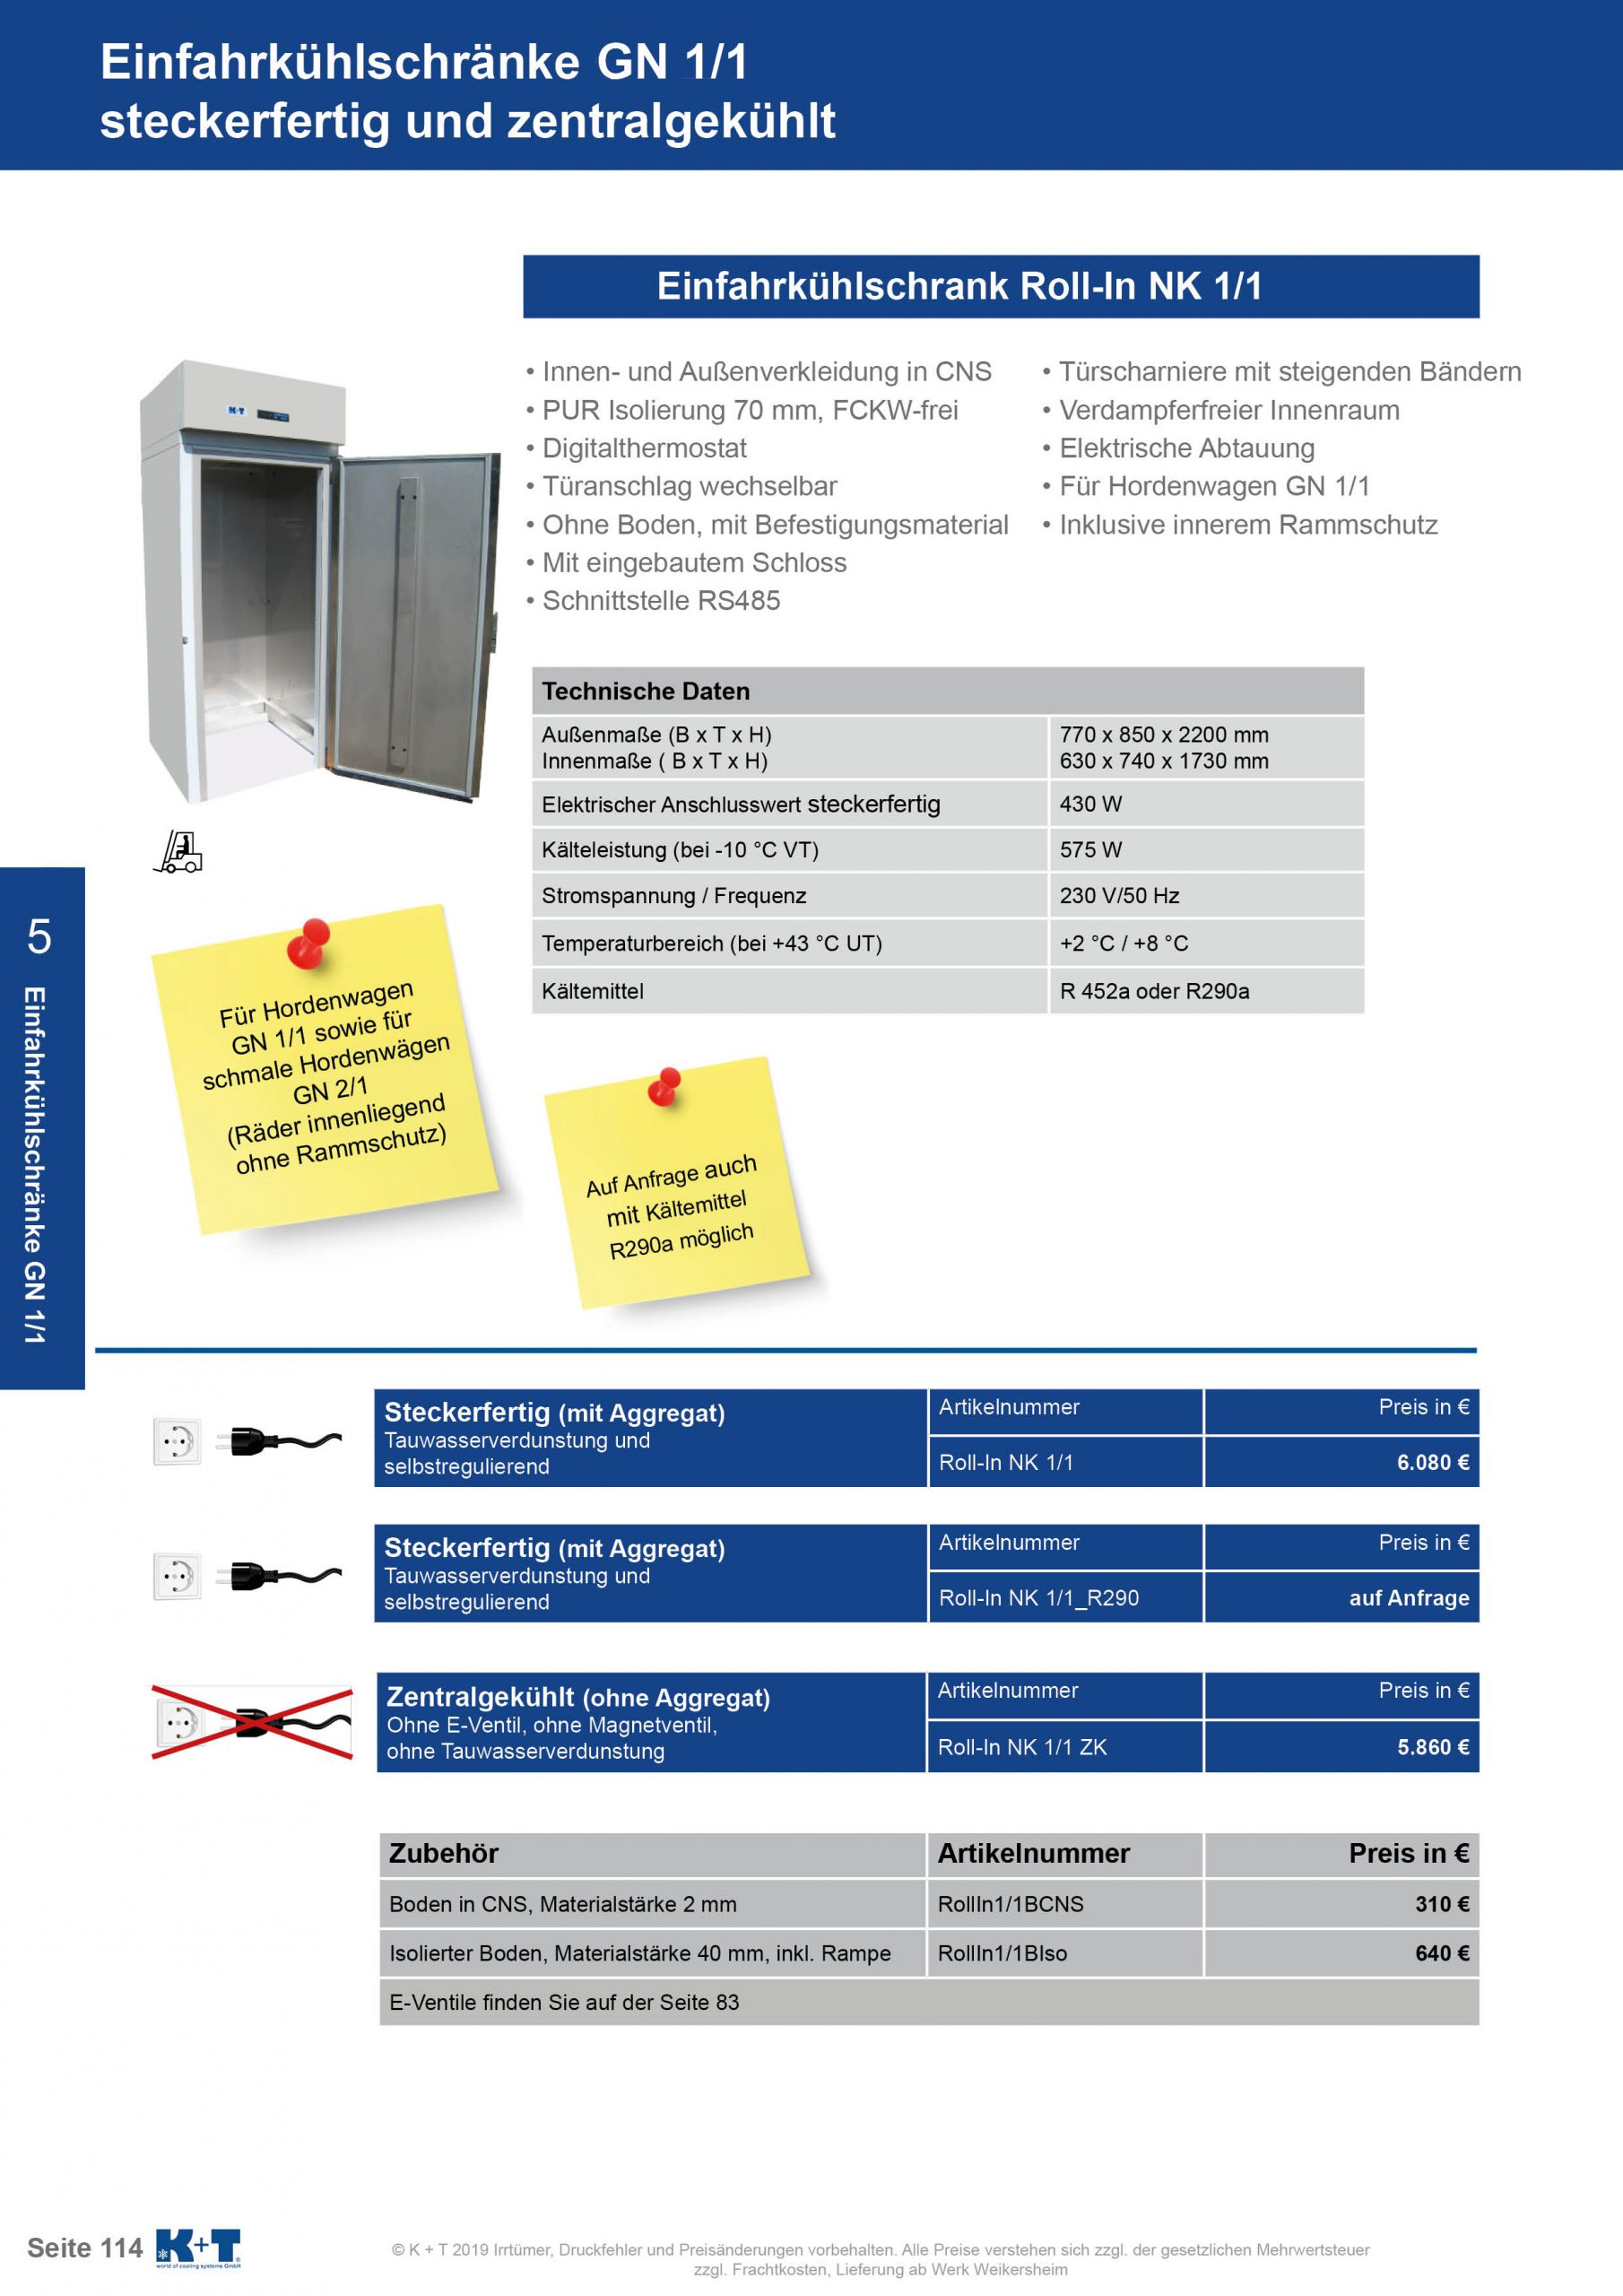 Einfahrkühlschrank GN 1_1 zentralgekühlt